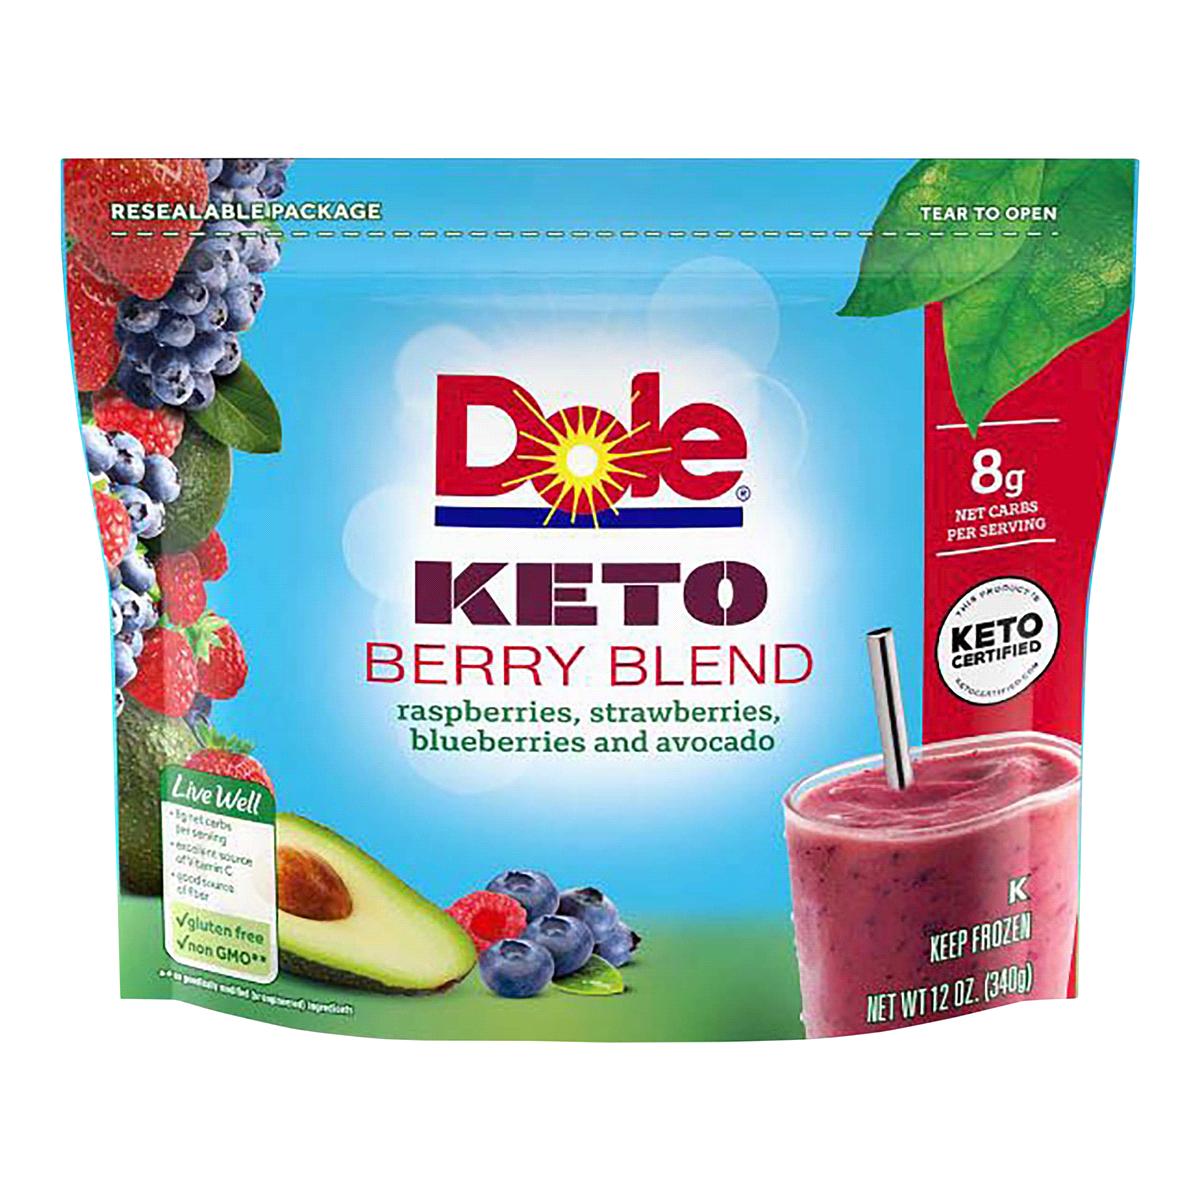 Keto Berry Blend - Dole - Keto Certified by the Paleo Foundation